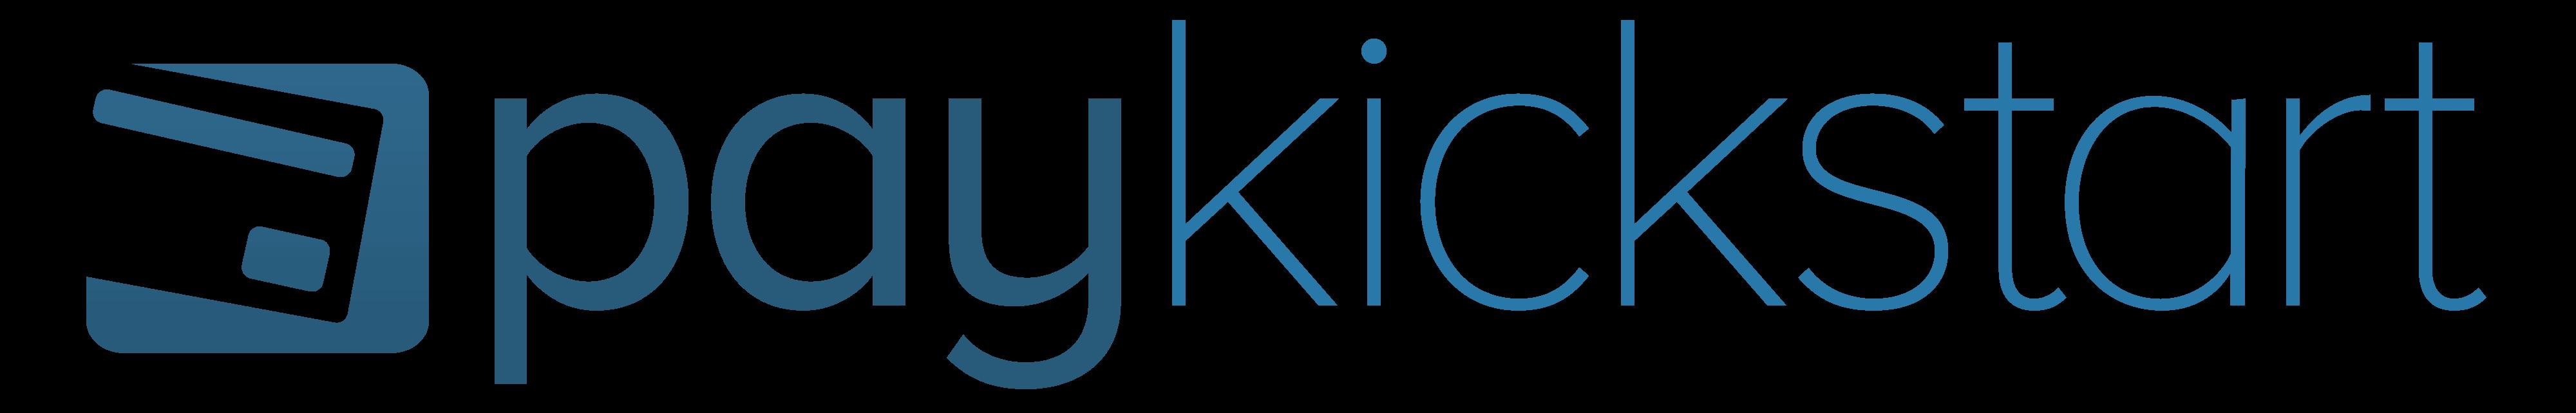 ProductDyno-PayKickStart